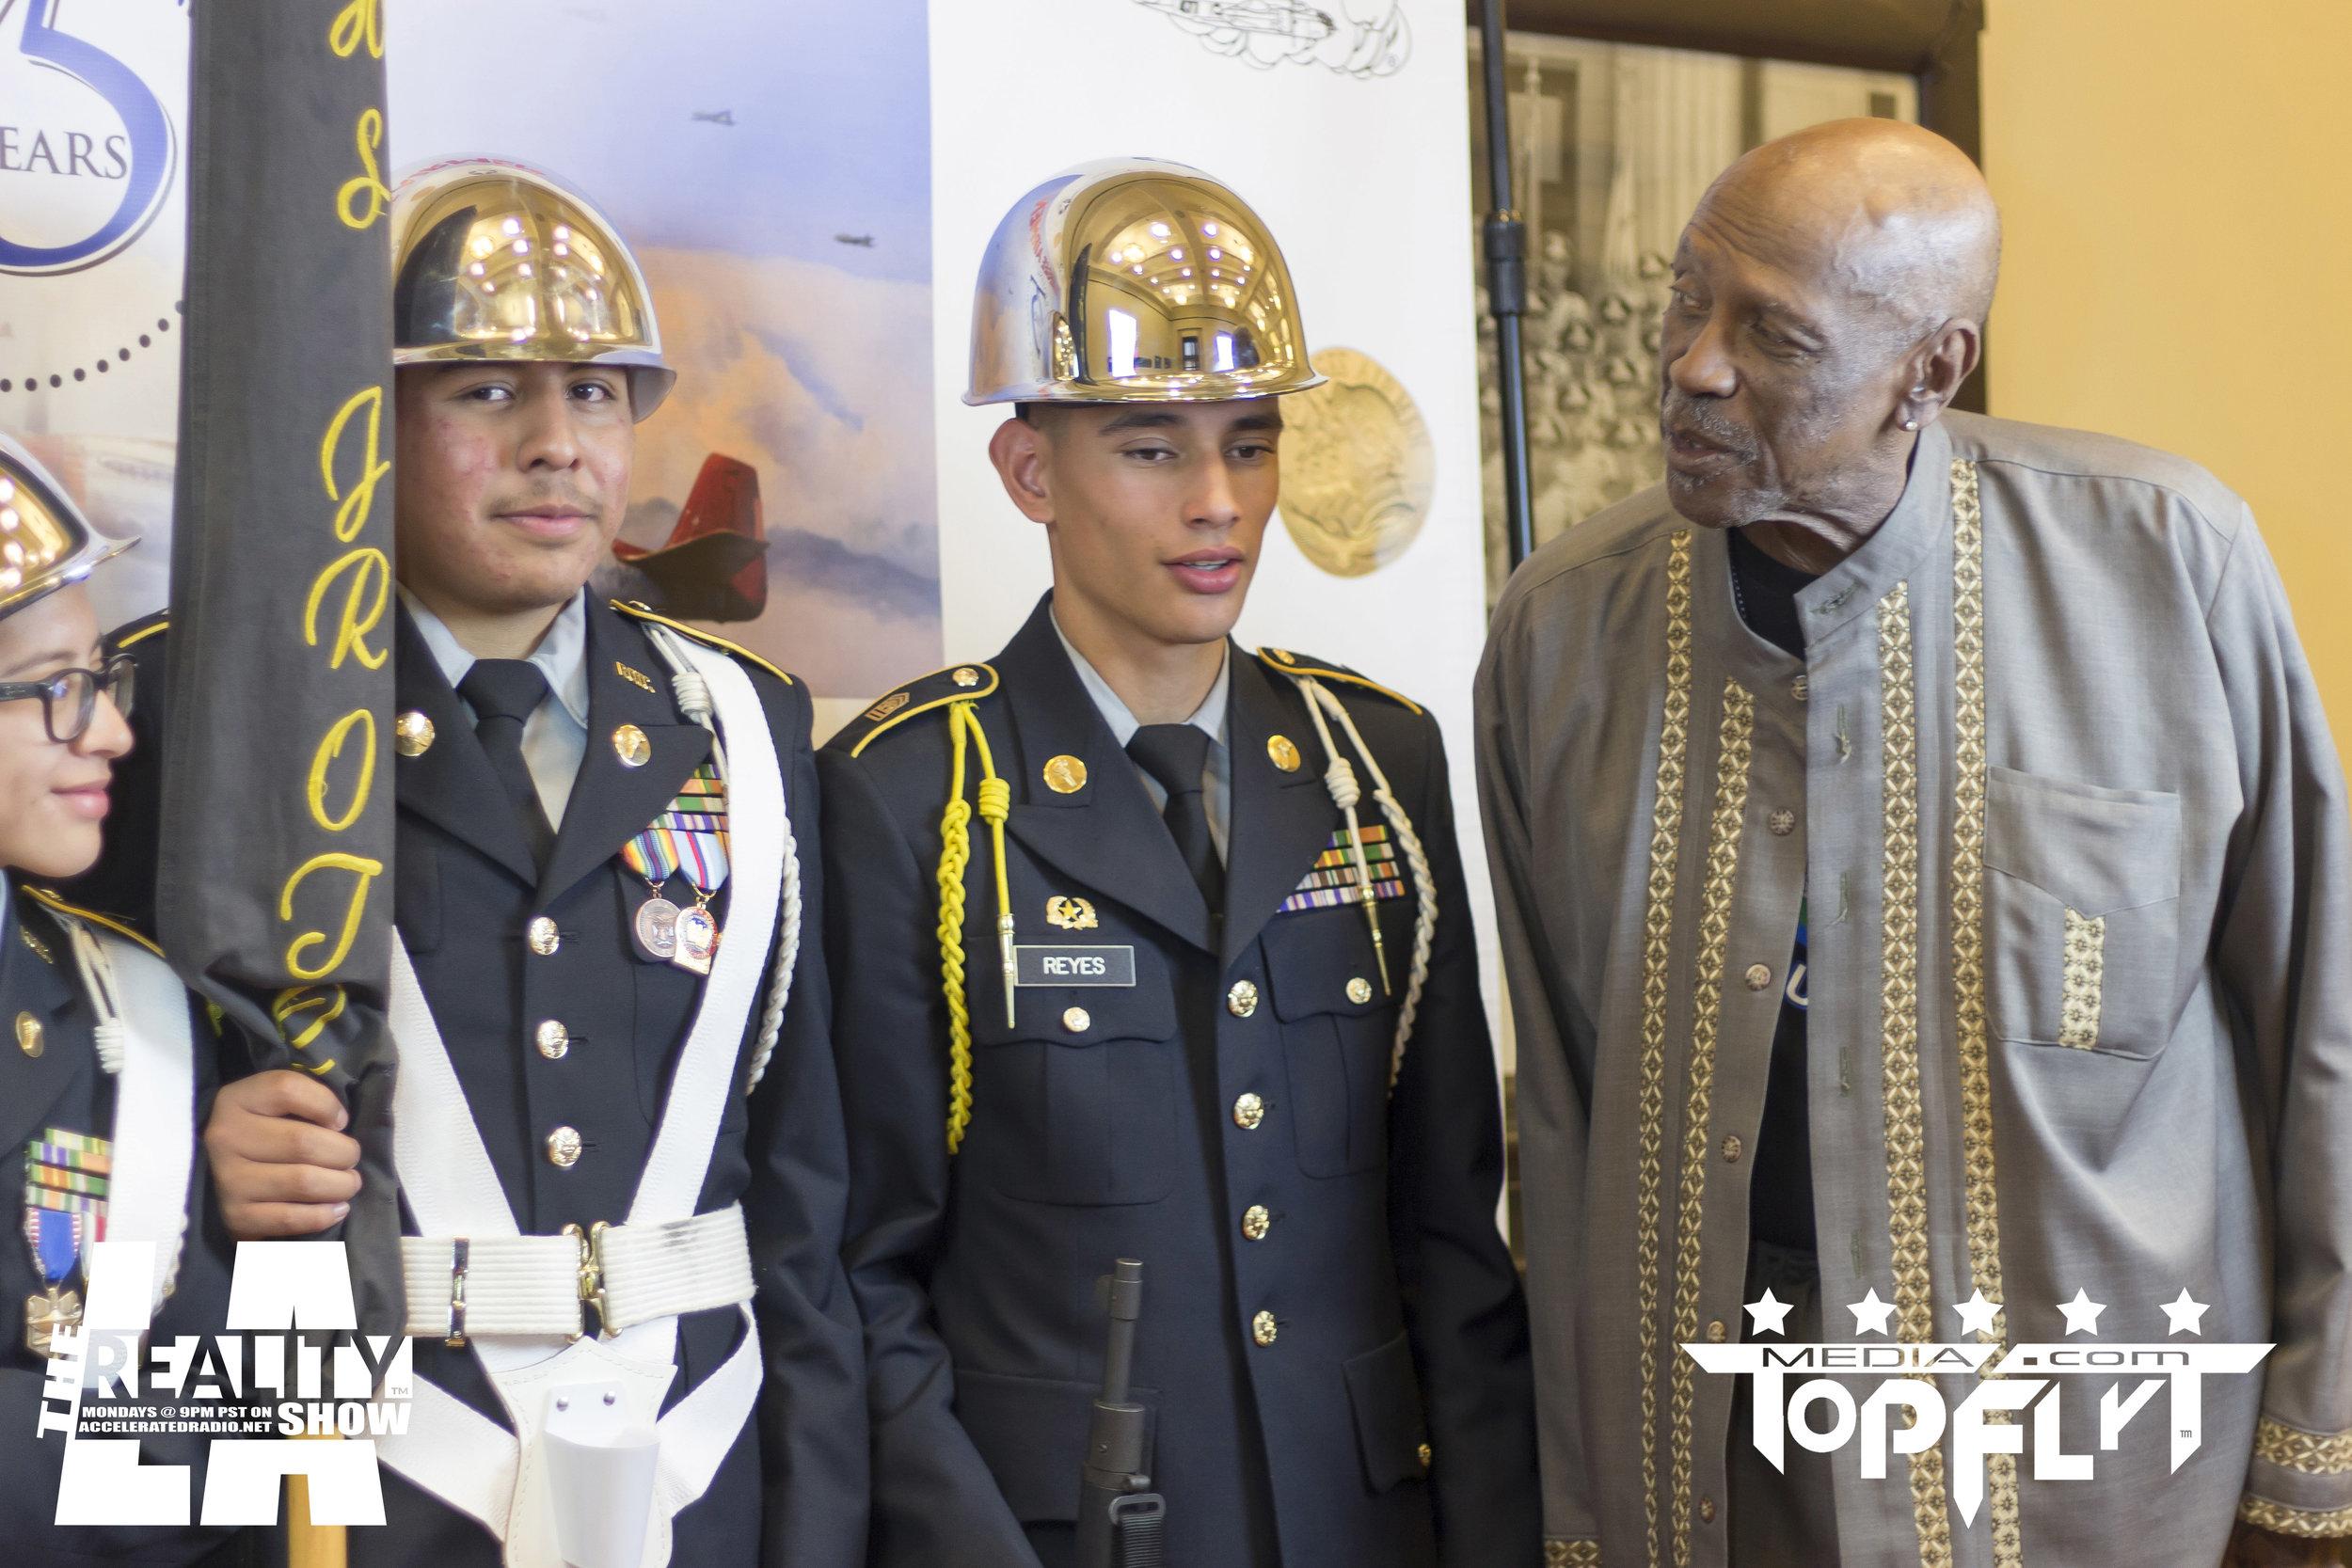 The Reality Show LA - Tuskegee Airmen 75th Anniversary VIP Reception_1.jpg